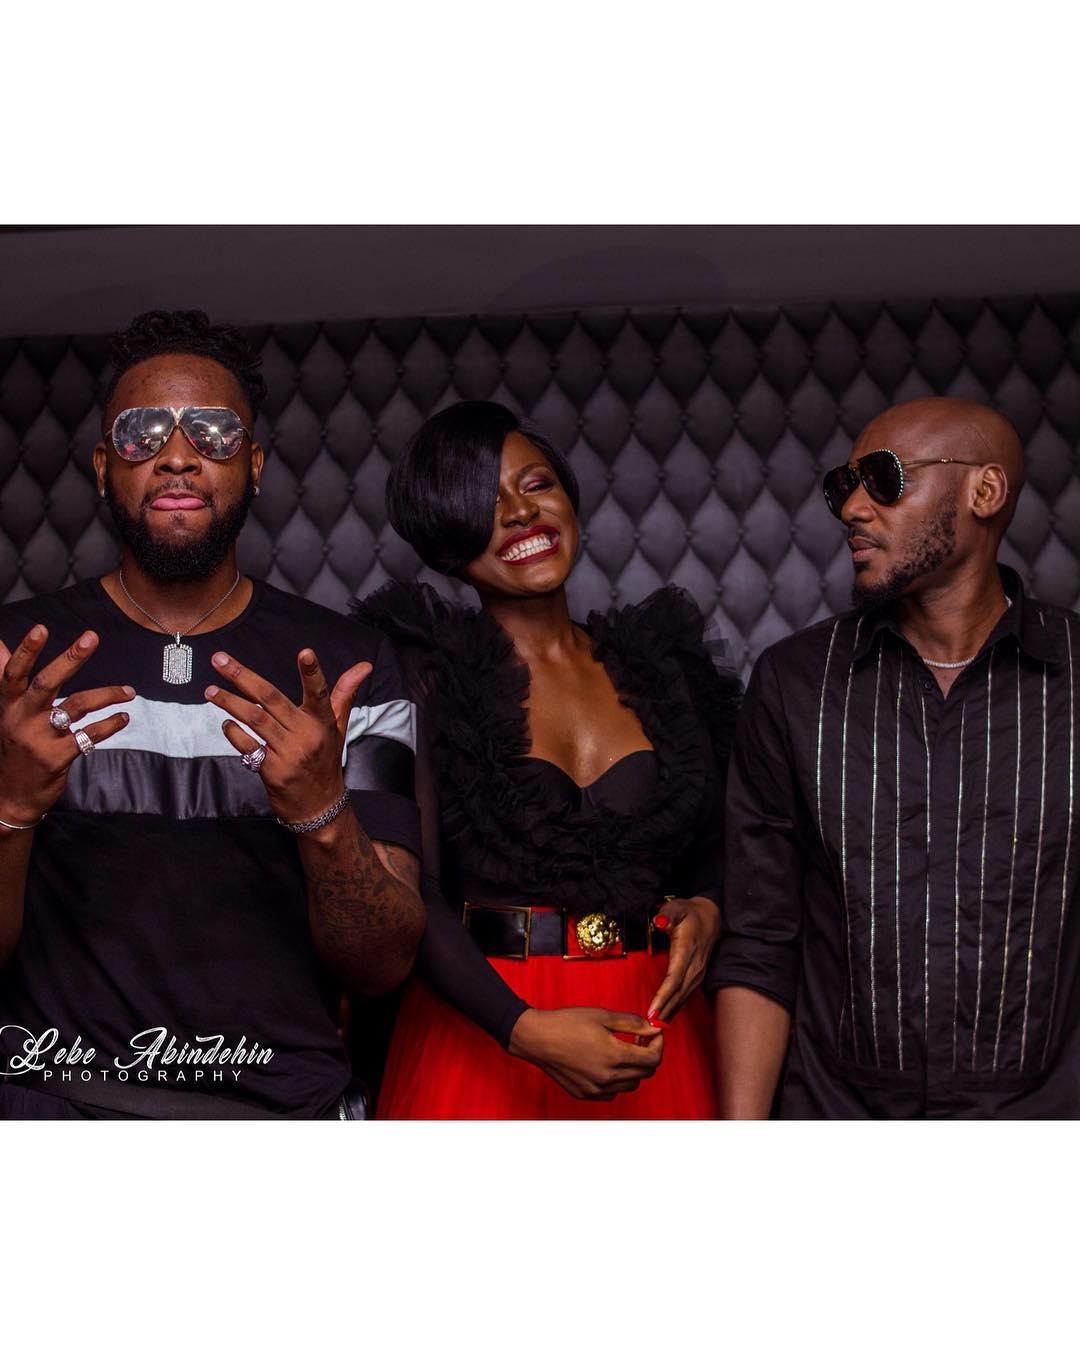 9169050 al jpeg495cae3108a2efb2ae07bae038090dcf - BBNaija Alex spotted with TeddyA and 2baba at Campari Lagos Party [Photos]